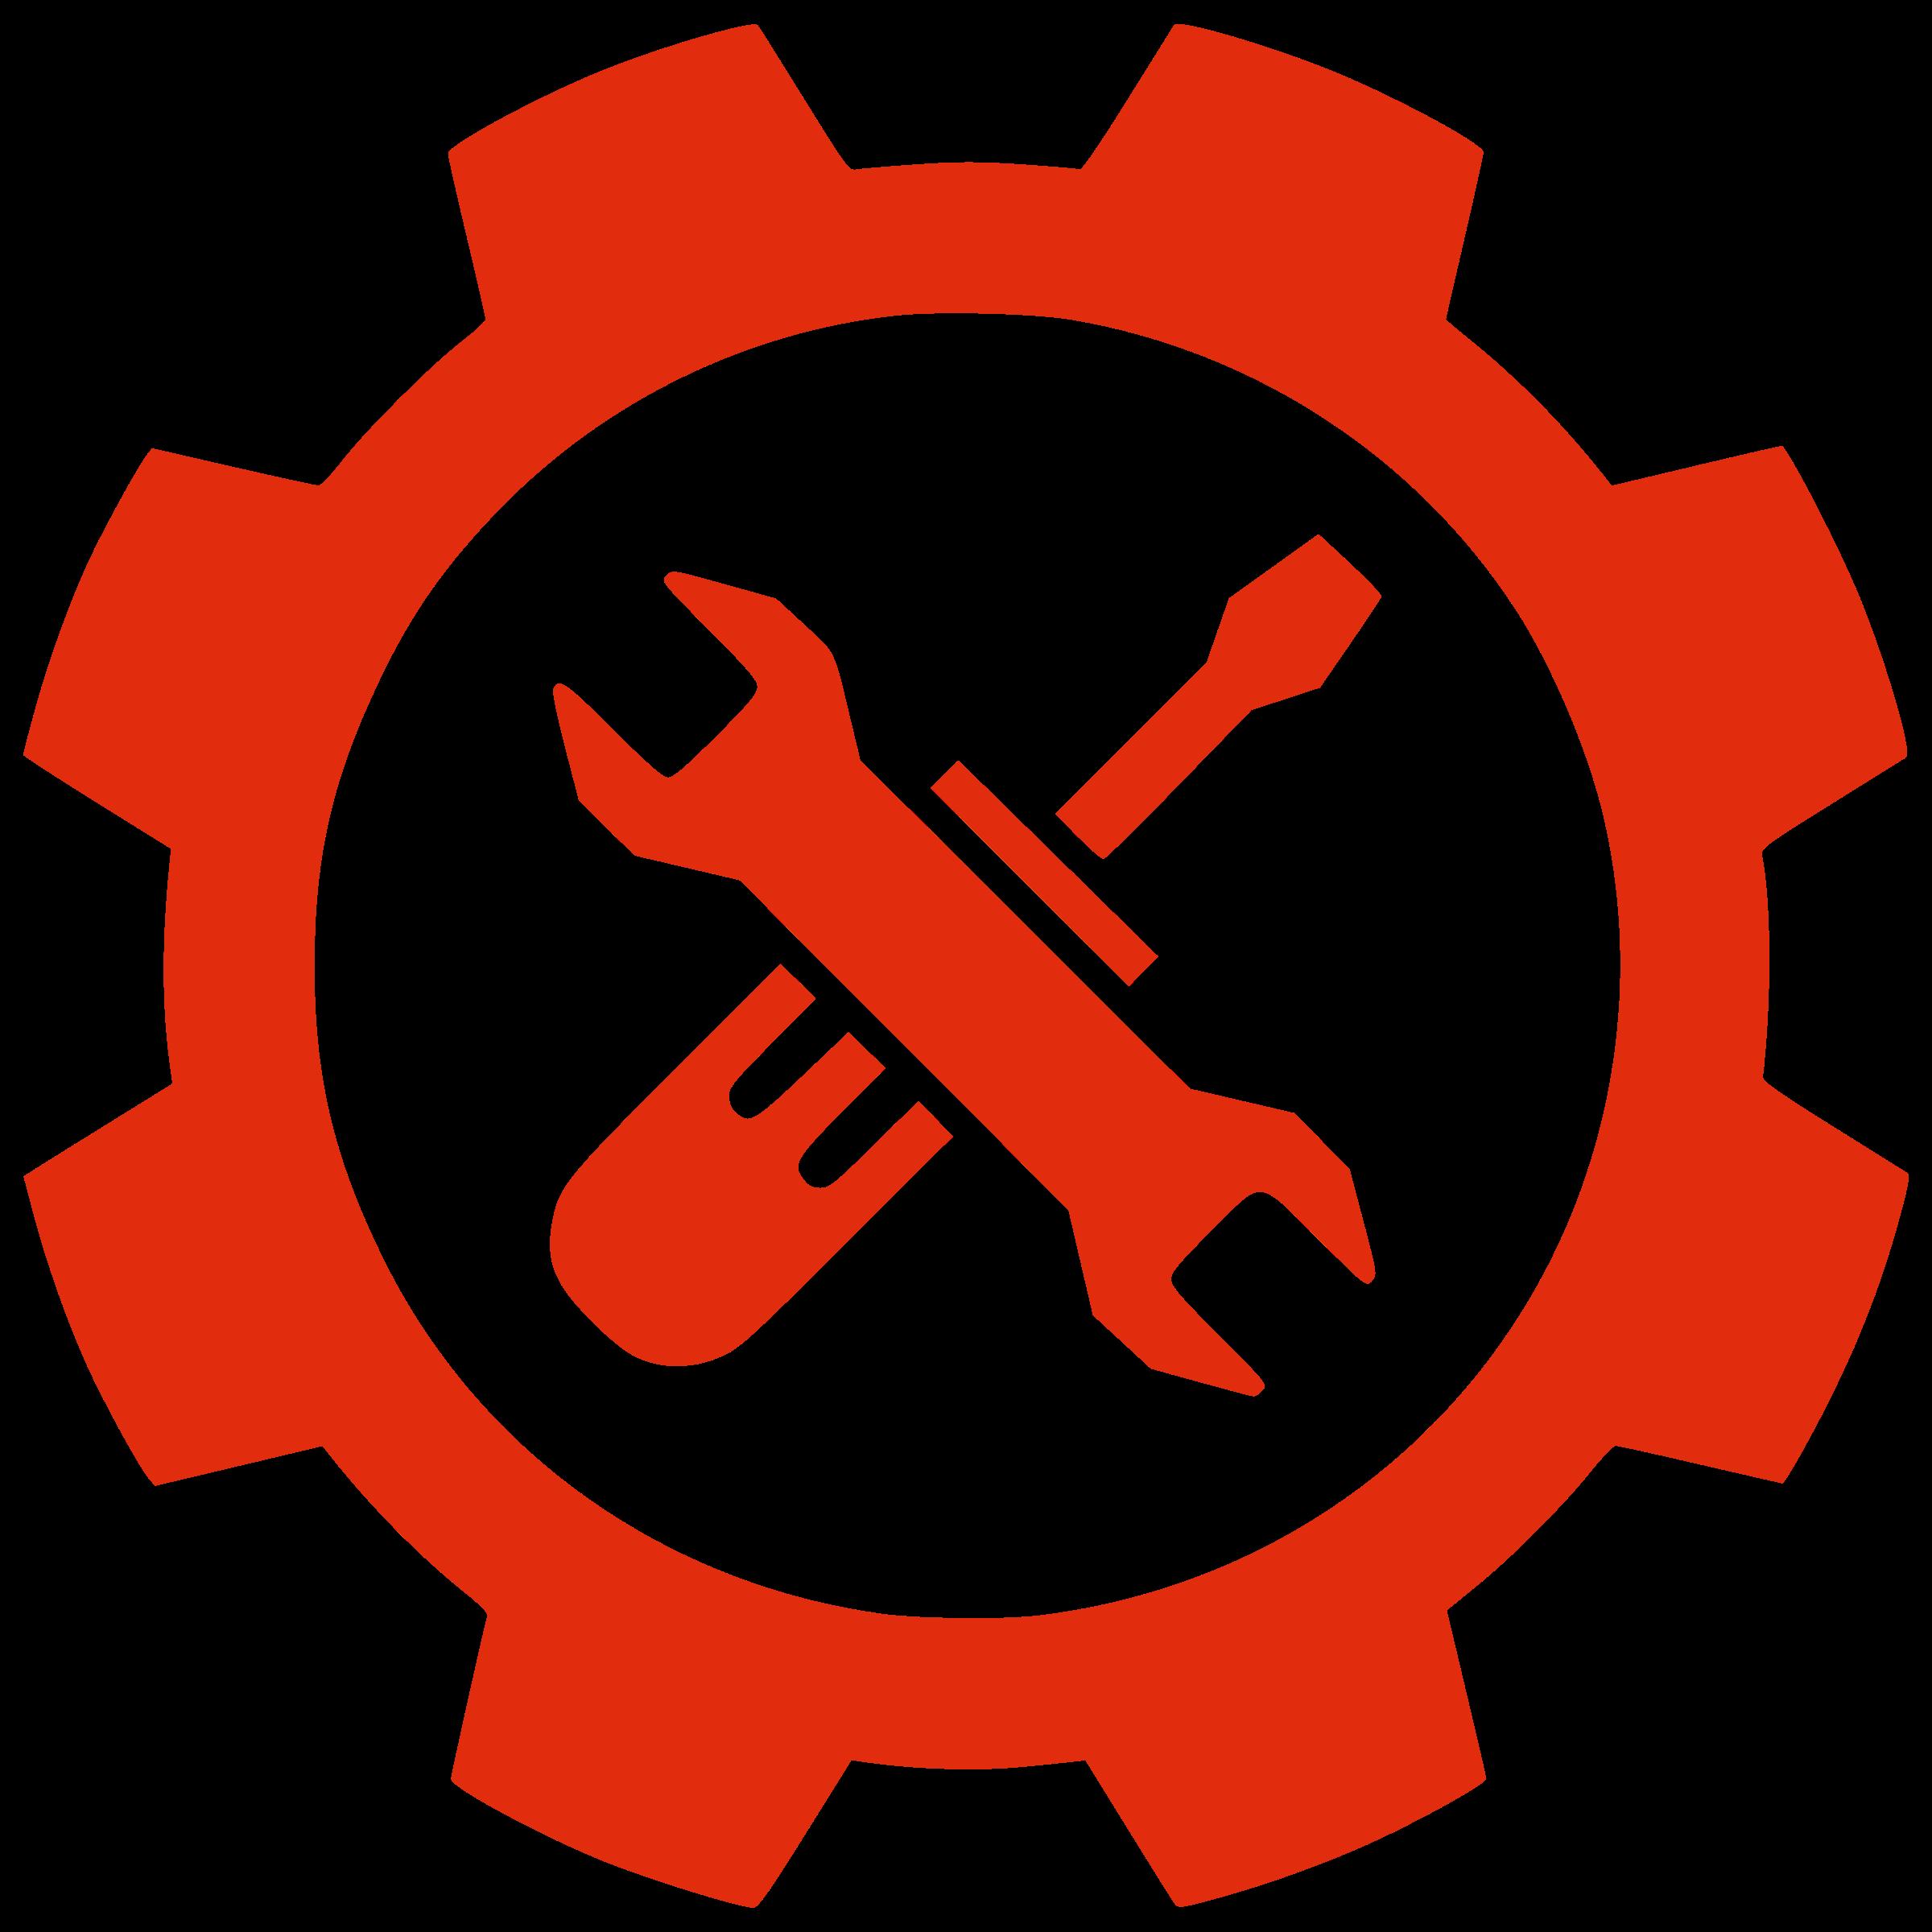 Tool PNG - 1241